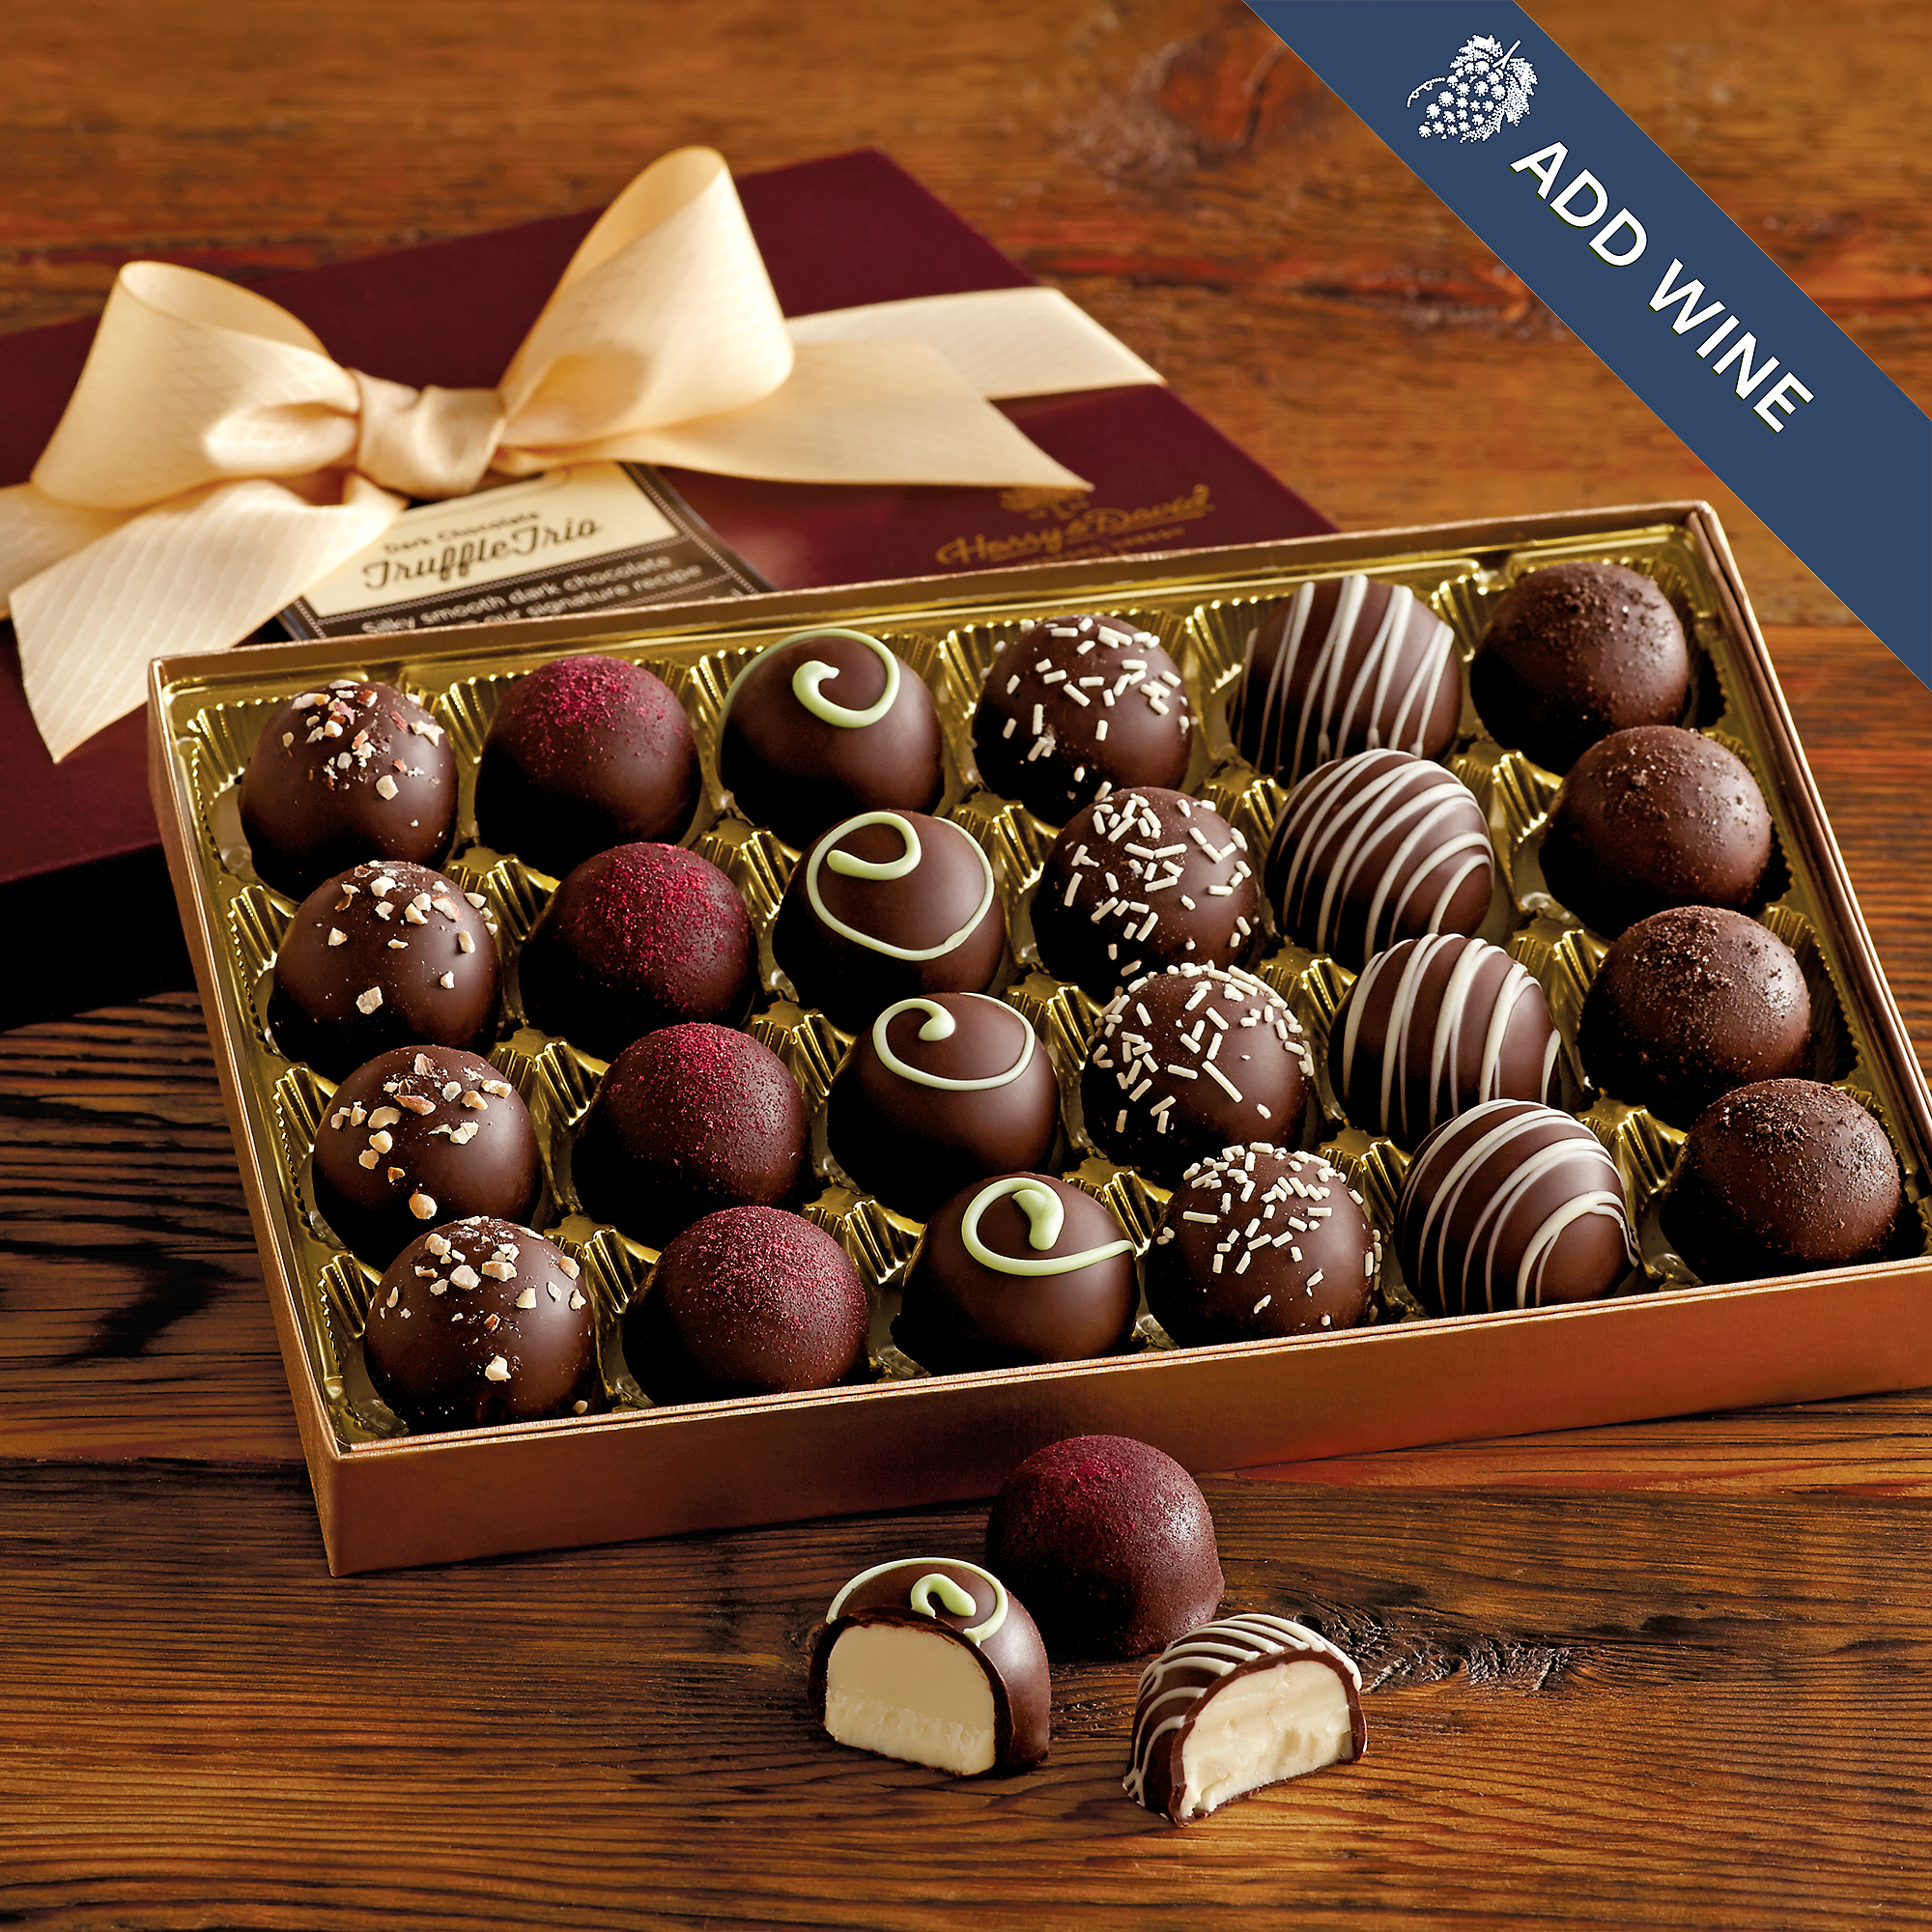 Dark Chocolate Truffles | Chocolate Gifts Delivered | Harry & David